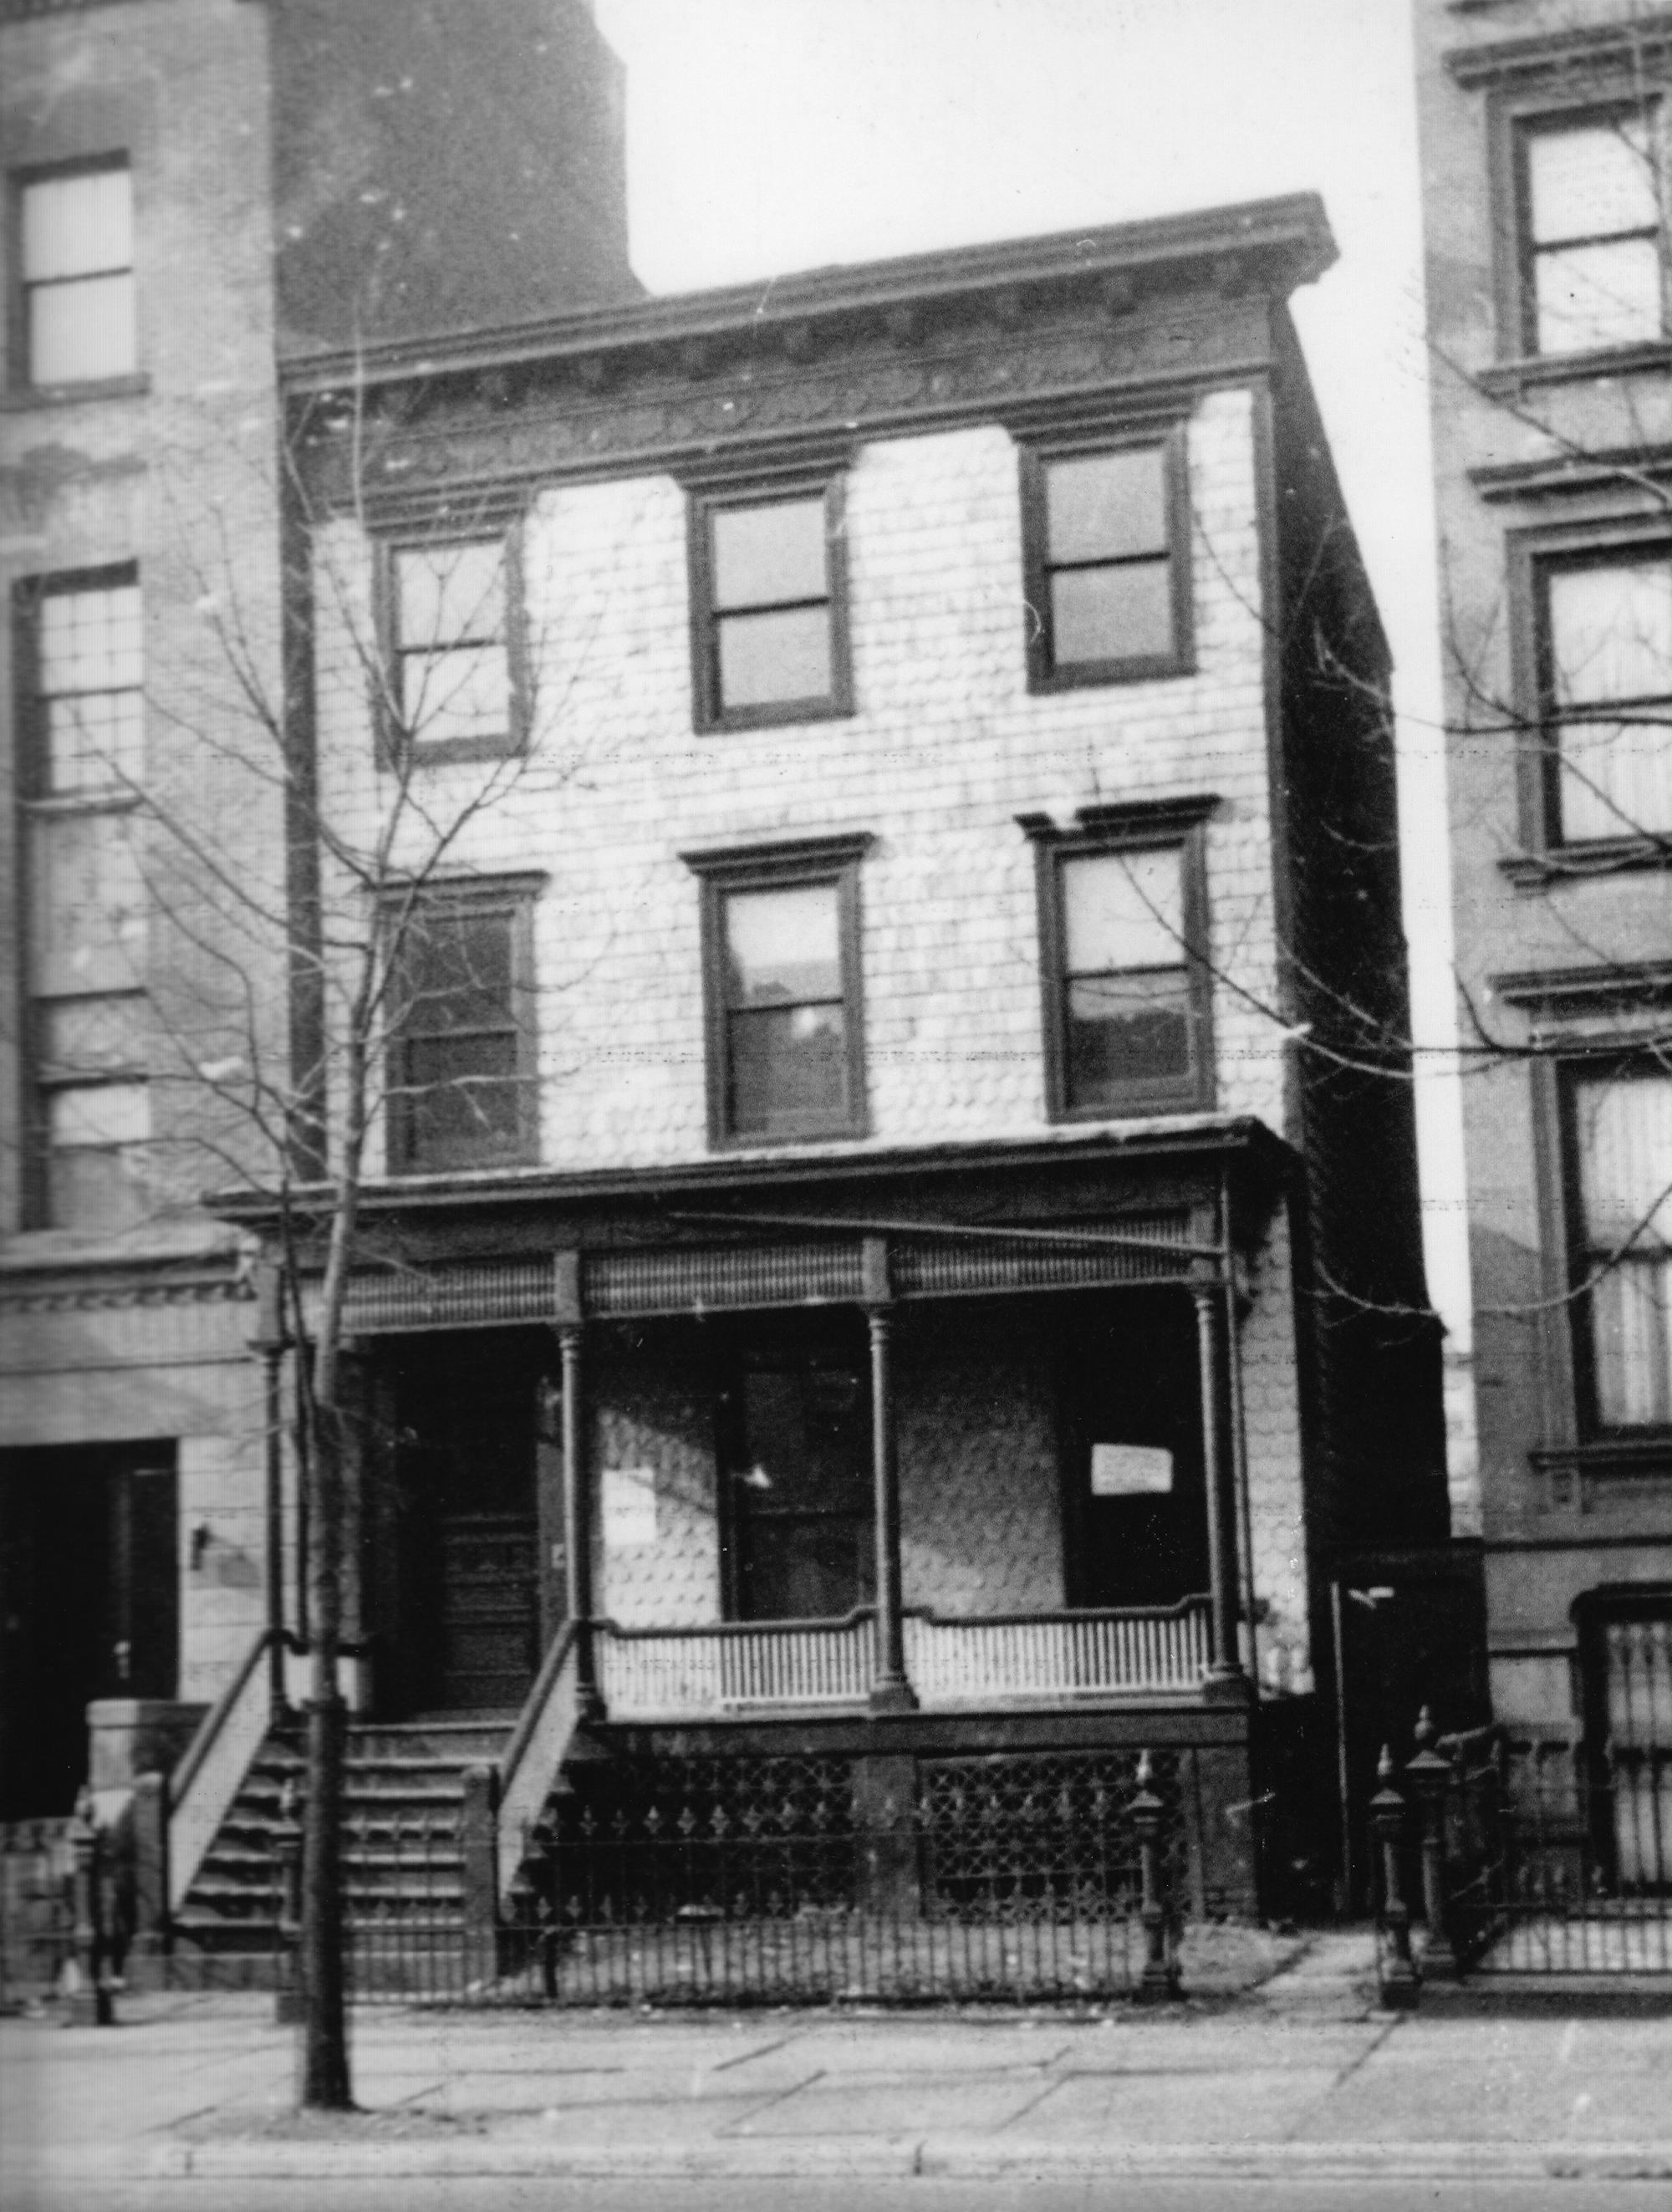 476 Washington Avenue in the 1960s